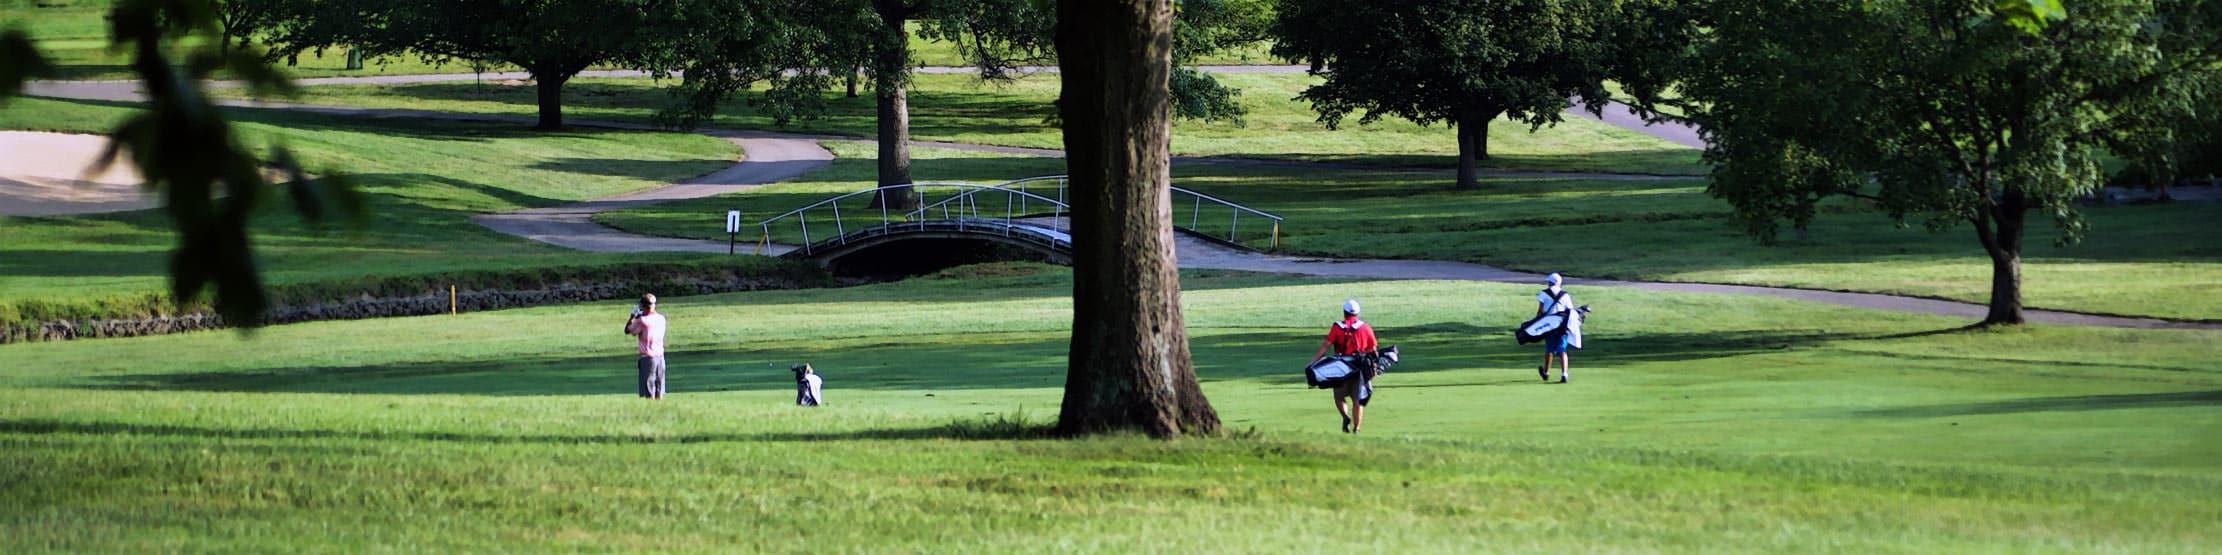 Otter Creek Golf Course - Columbus, Indiana